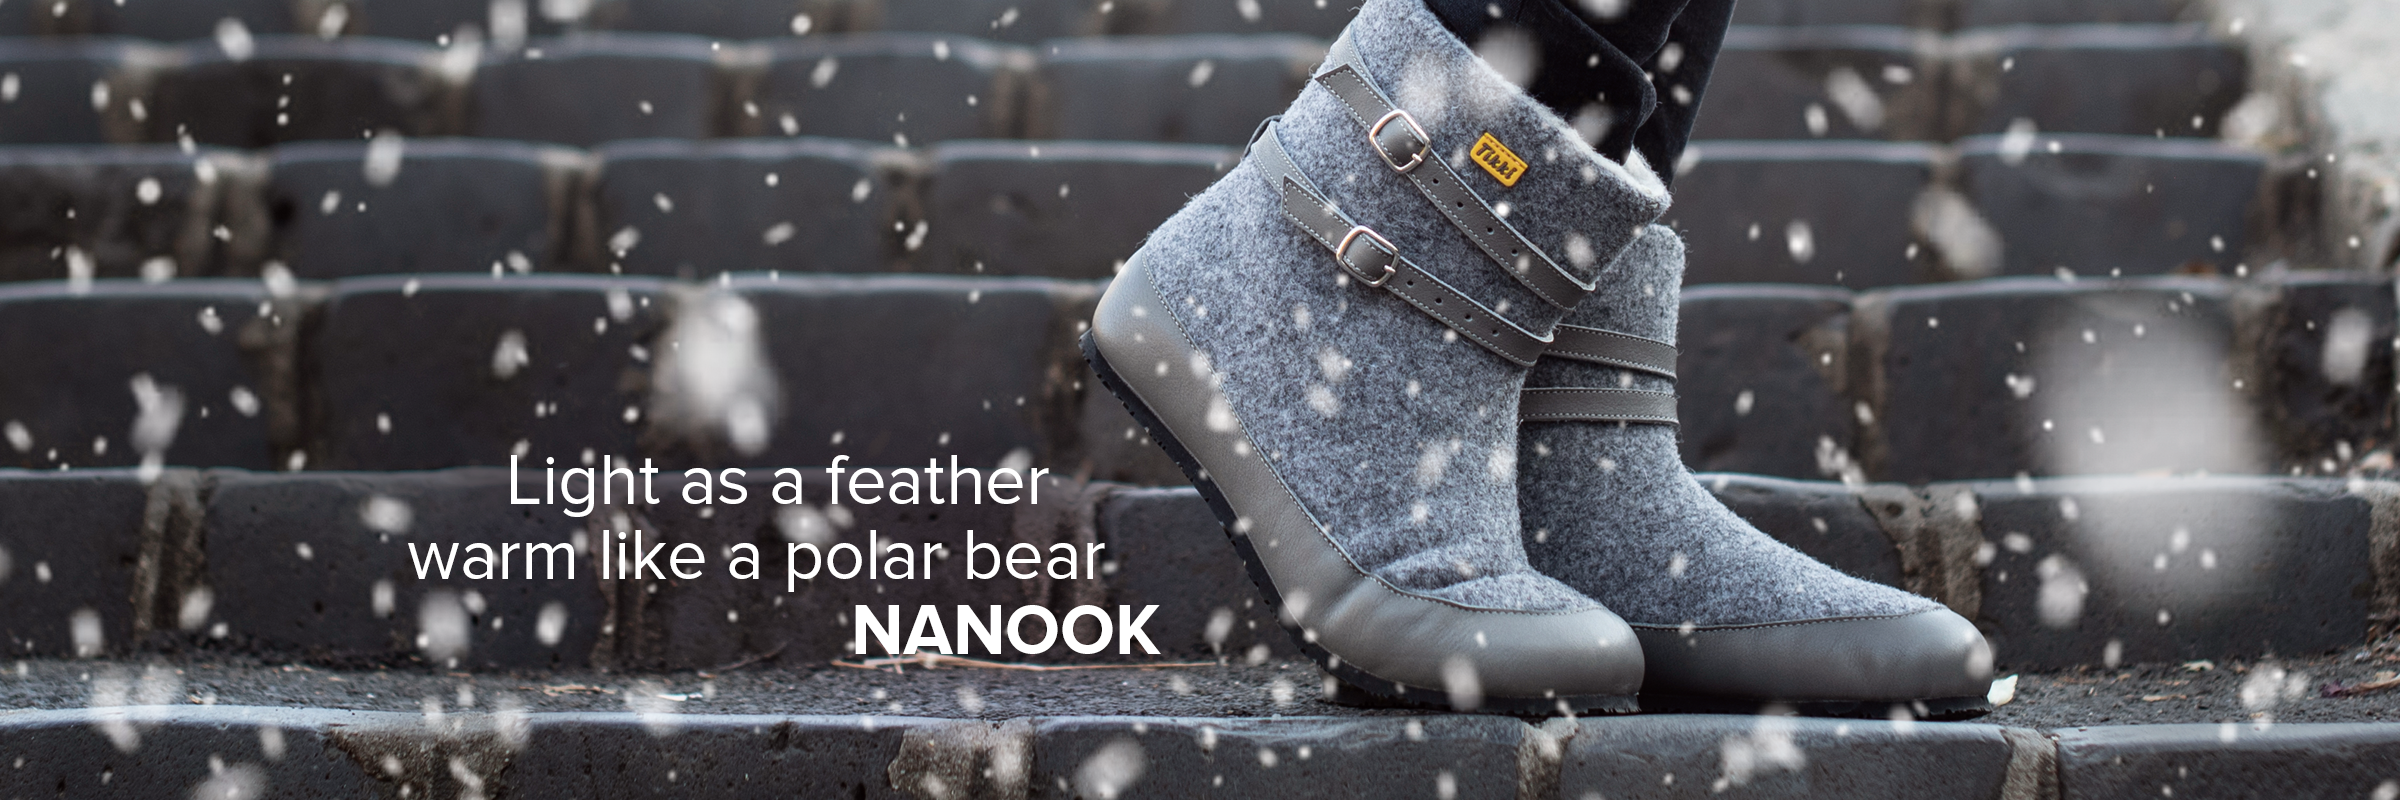 Tikki Nanook in winter 02